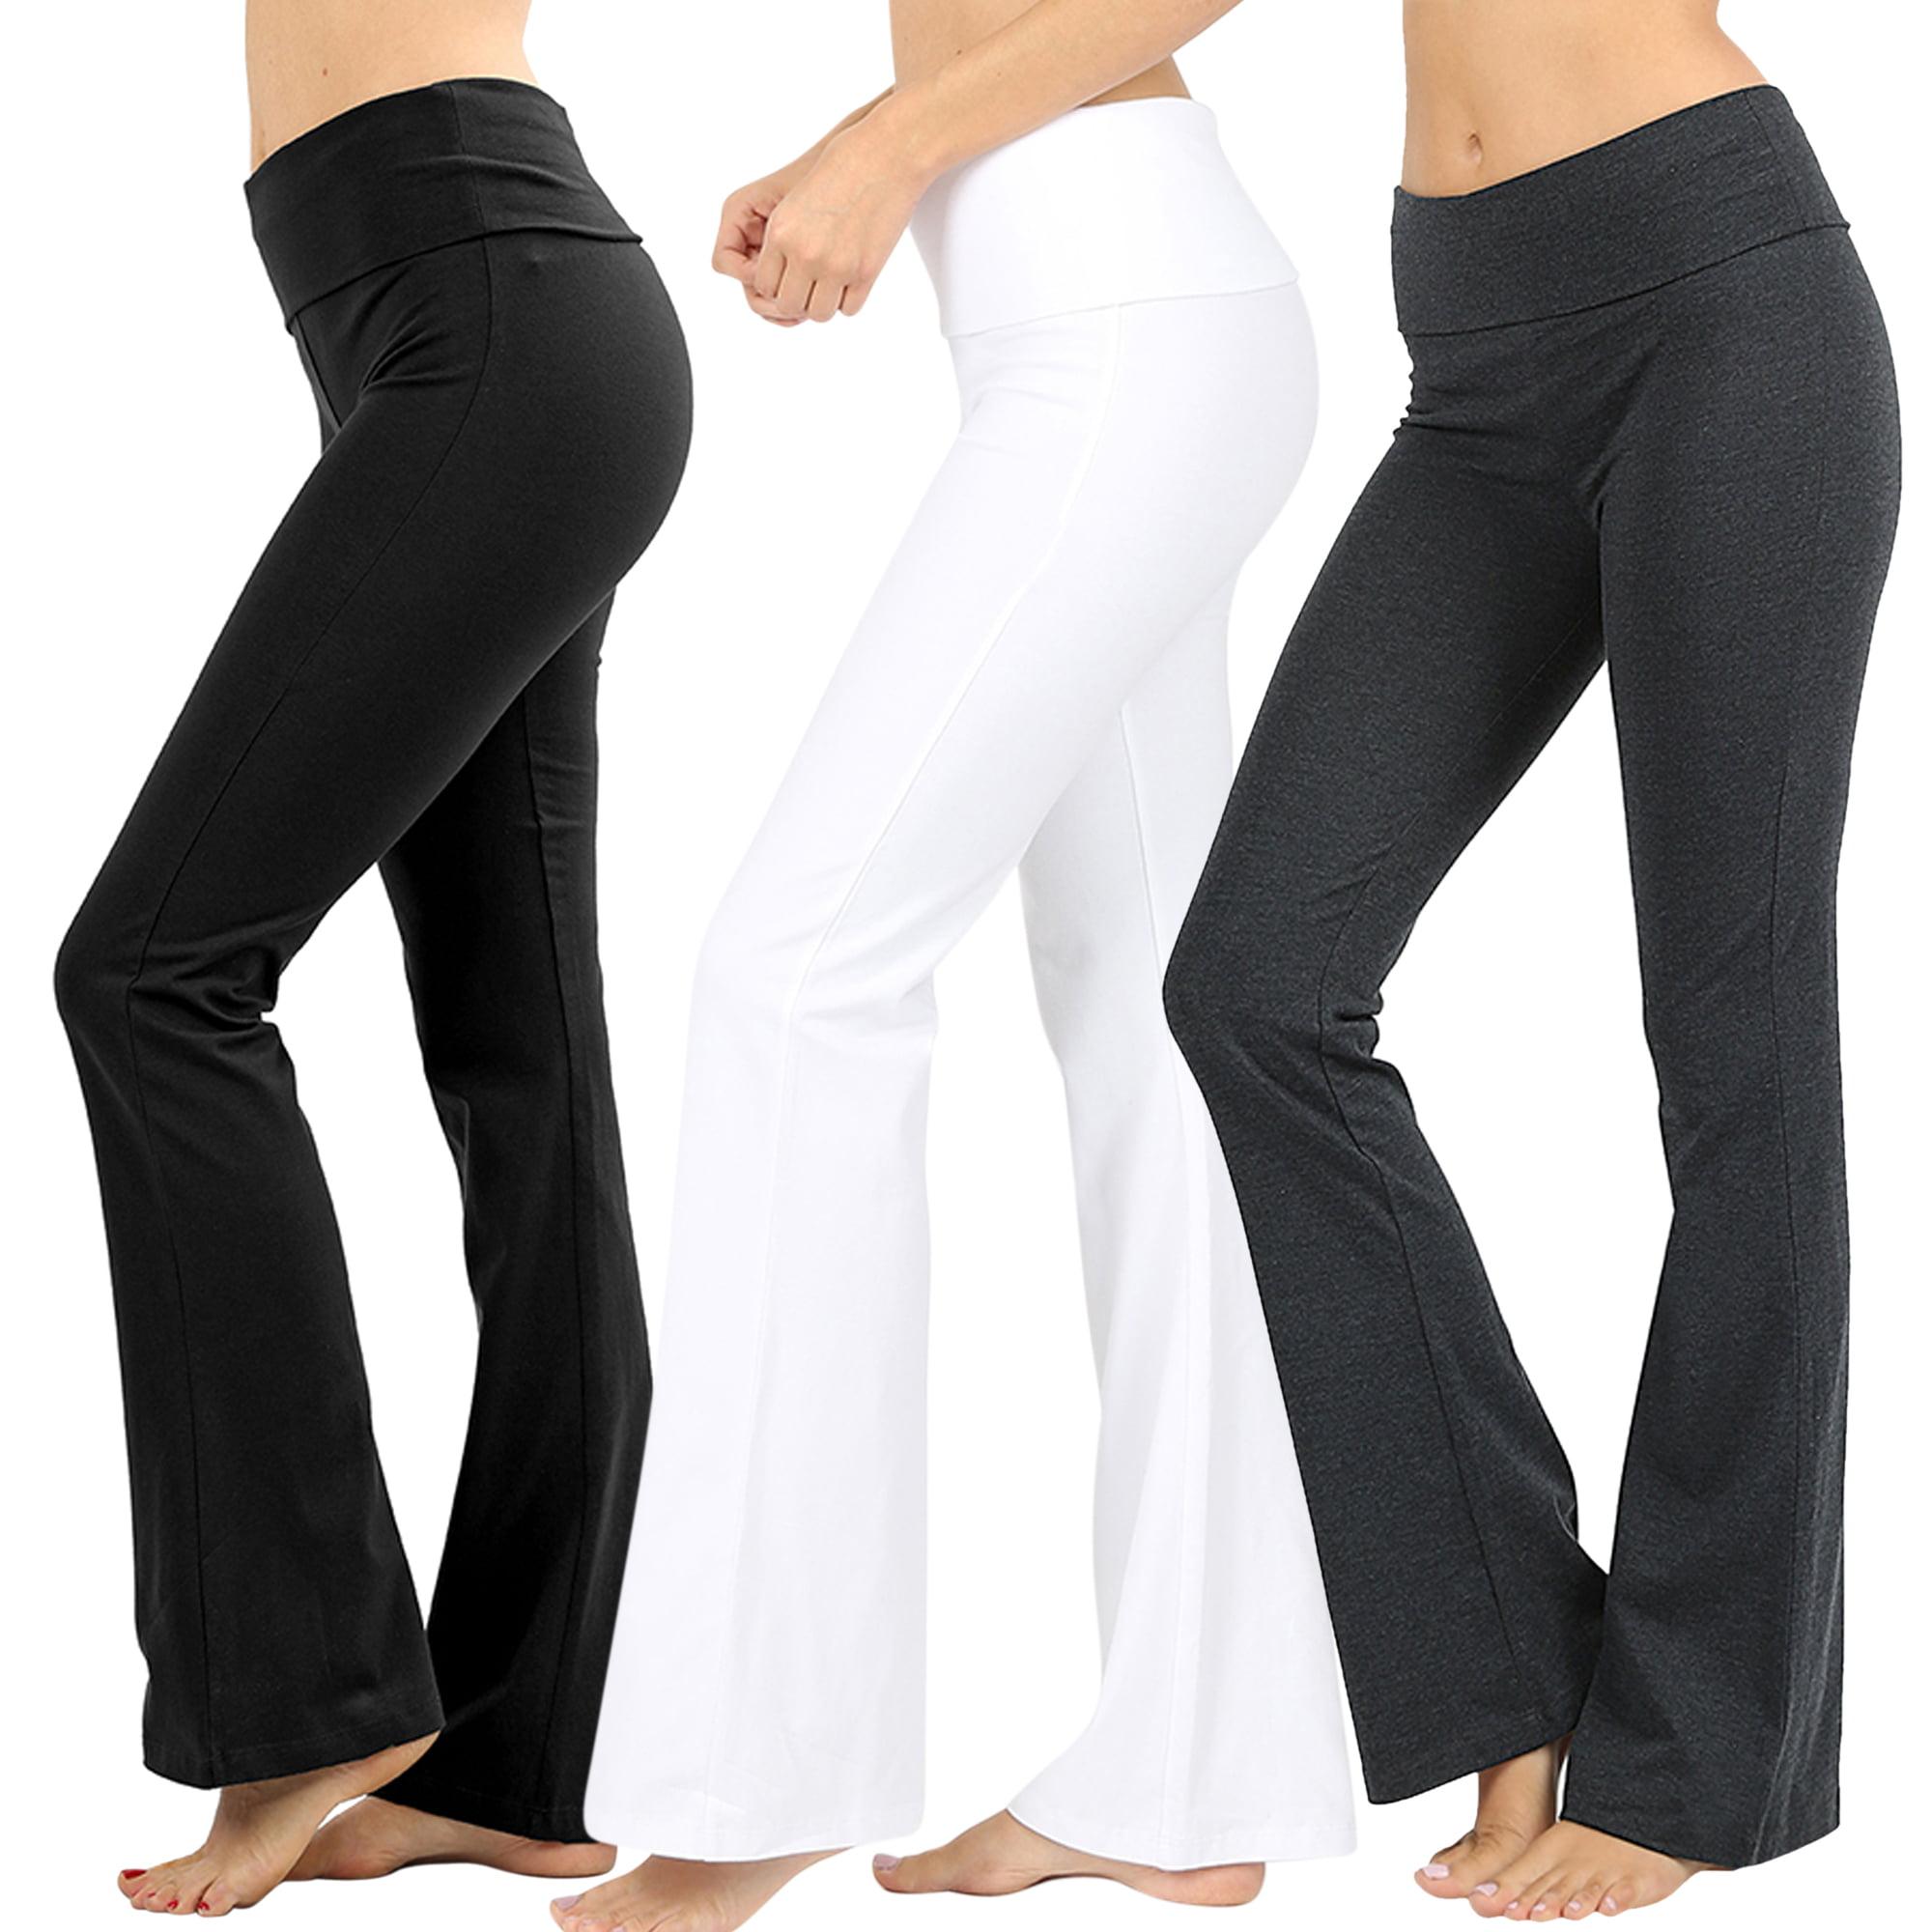 8d9248b232 TheLovely - Womens & Plus Stretch Cotton Foldover Waist Bootleg Workout  Yoga Pants - Walmart.com